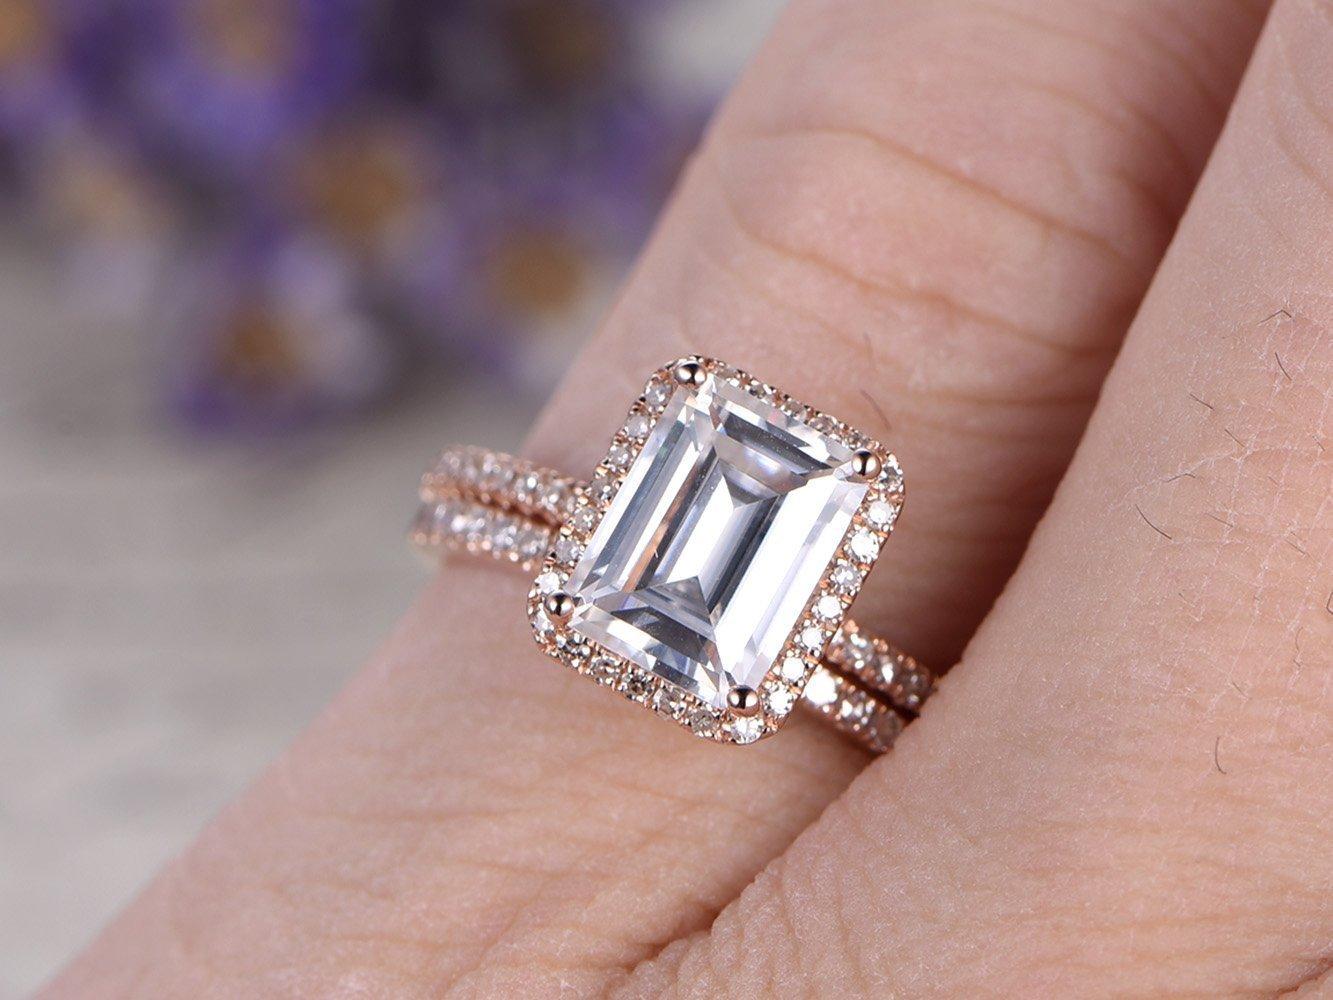 Amazon.com: 2pcs Wedding Ring Set, 6x8mm Emerald Cut 1.8ct VS White ...